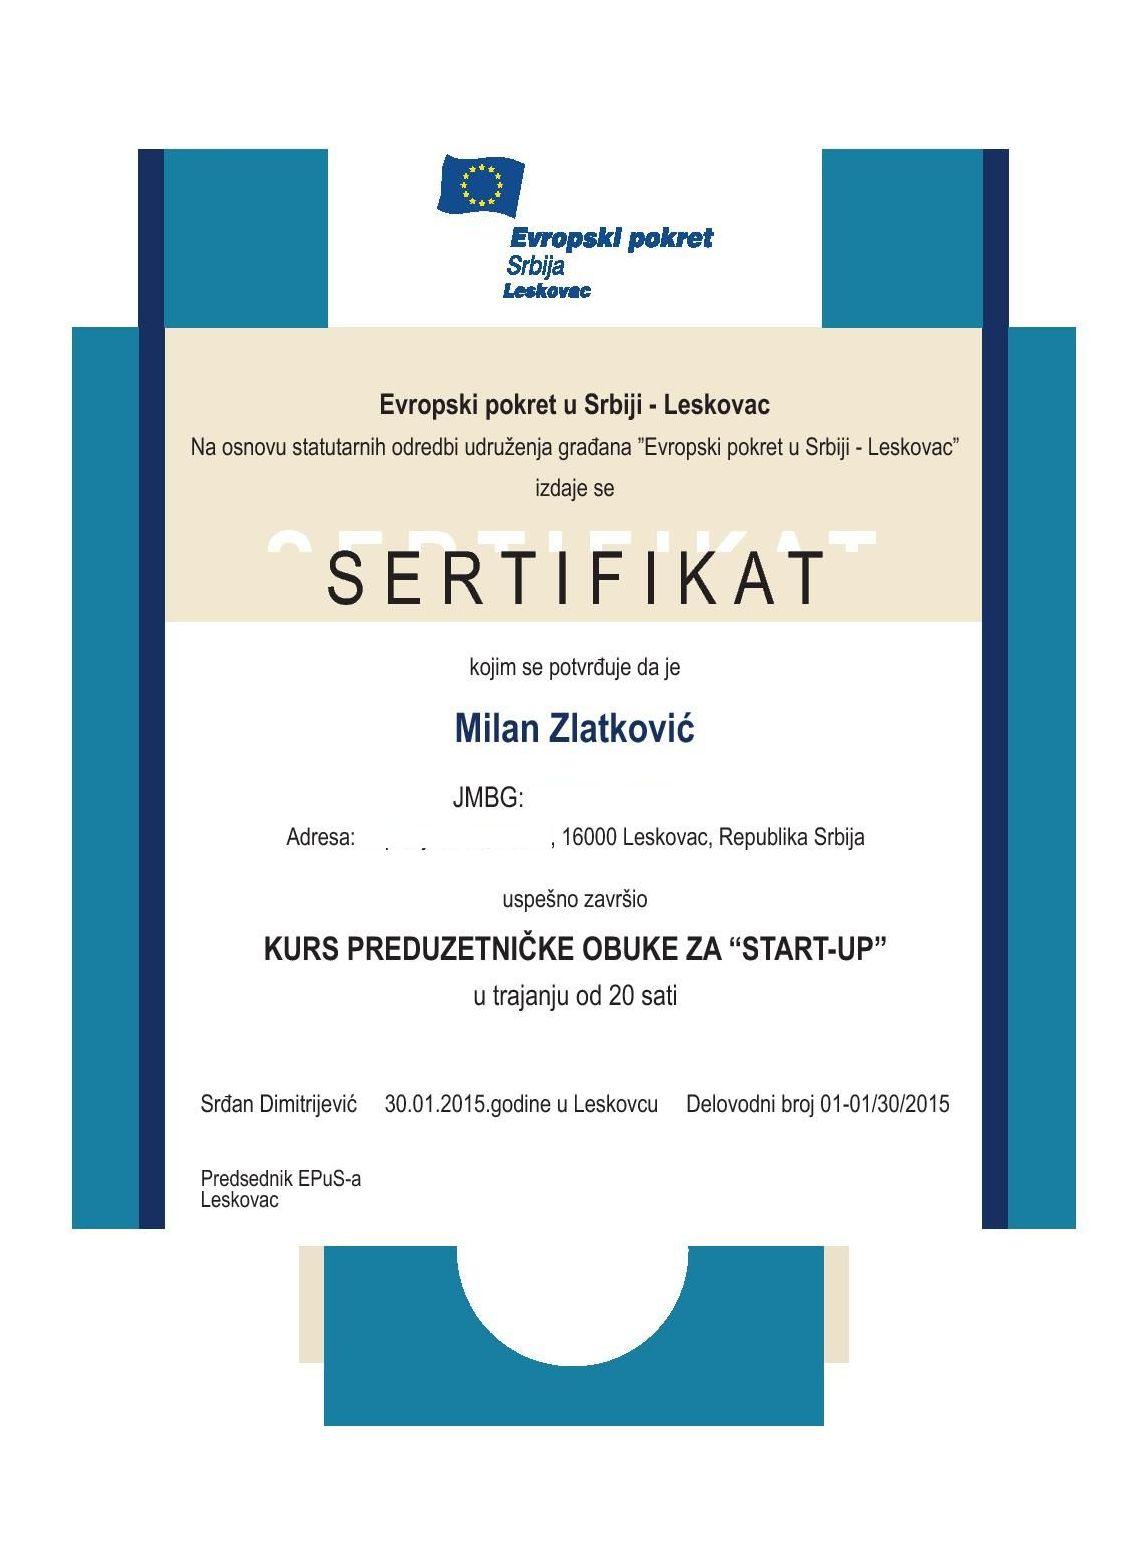 Sertifikati obuka Final - popunjeno, pdf-page-001